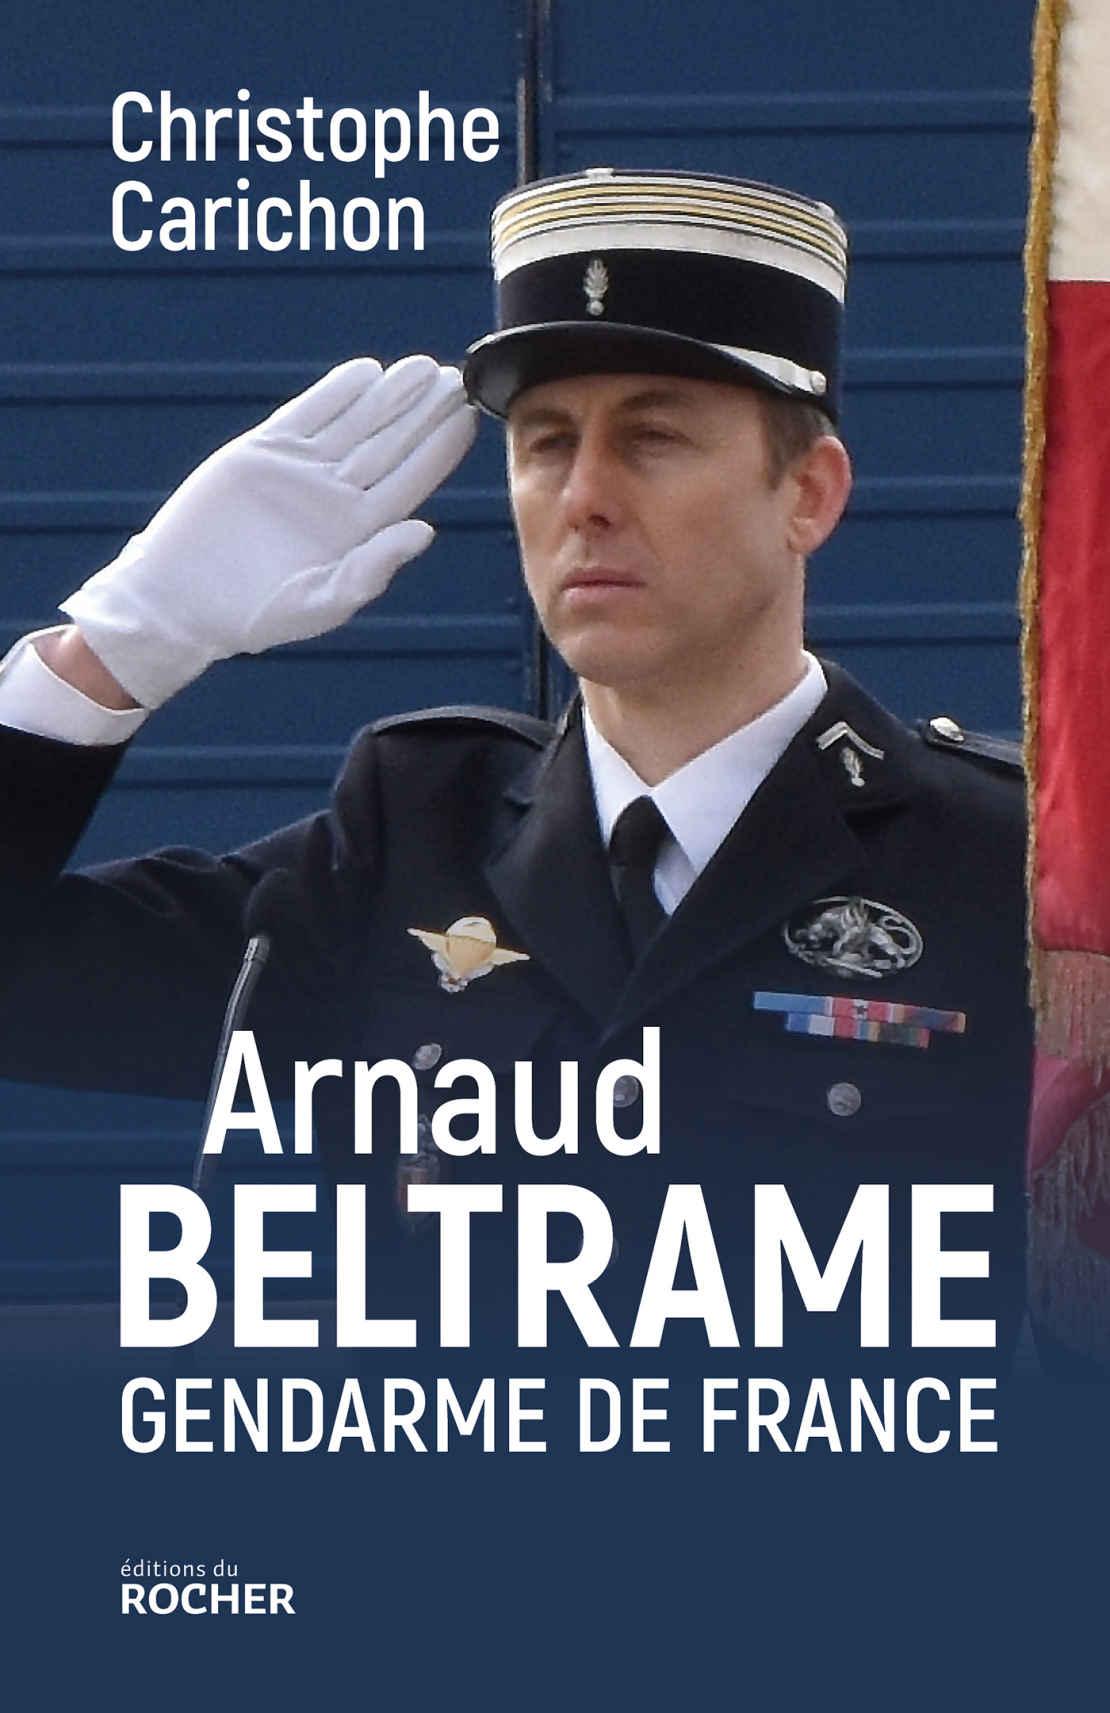 livre   arnaud beltrame  gendarme de france  de christophe